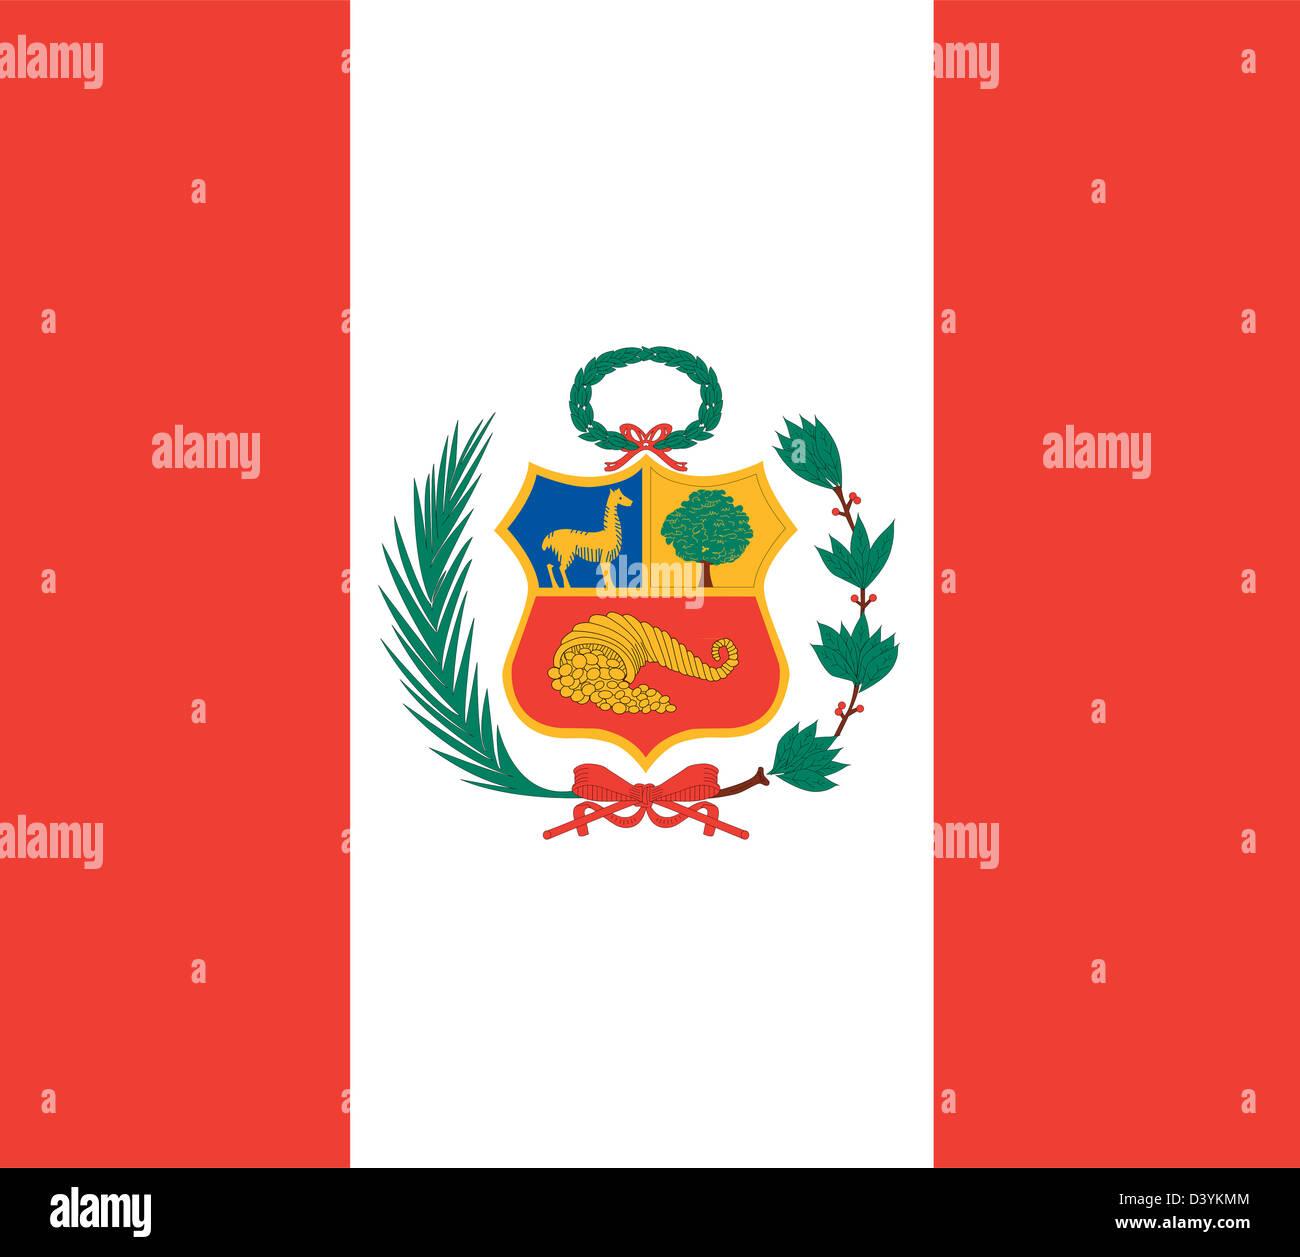 National Flag Of Peru Country World Peru Background Wallpaper Stock Photo Alamy